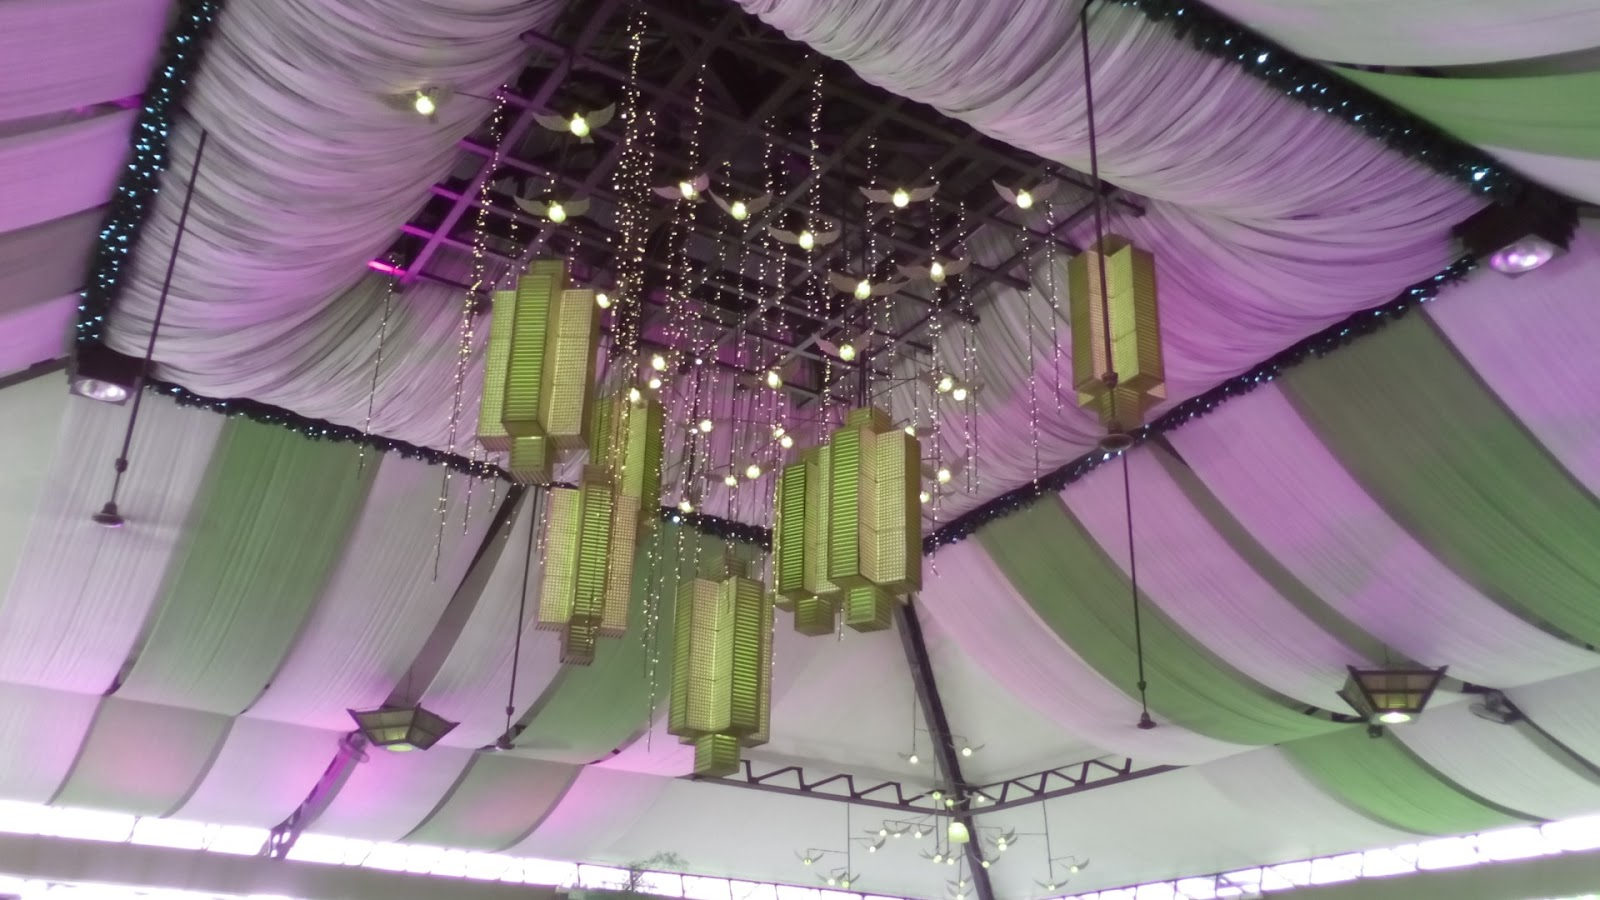 Metro Manila Venues: Gazebo Royale, your venue for weddings, debuts